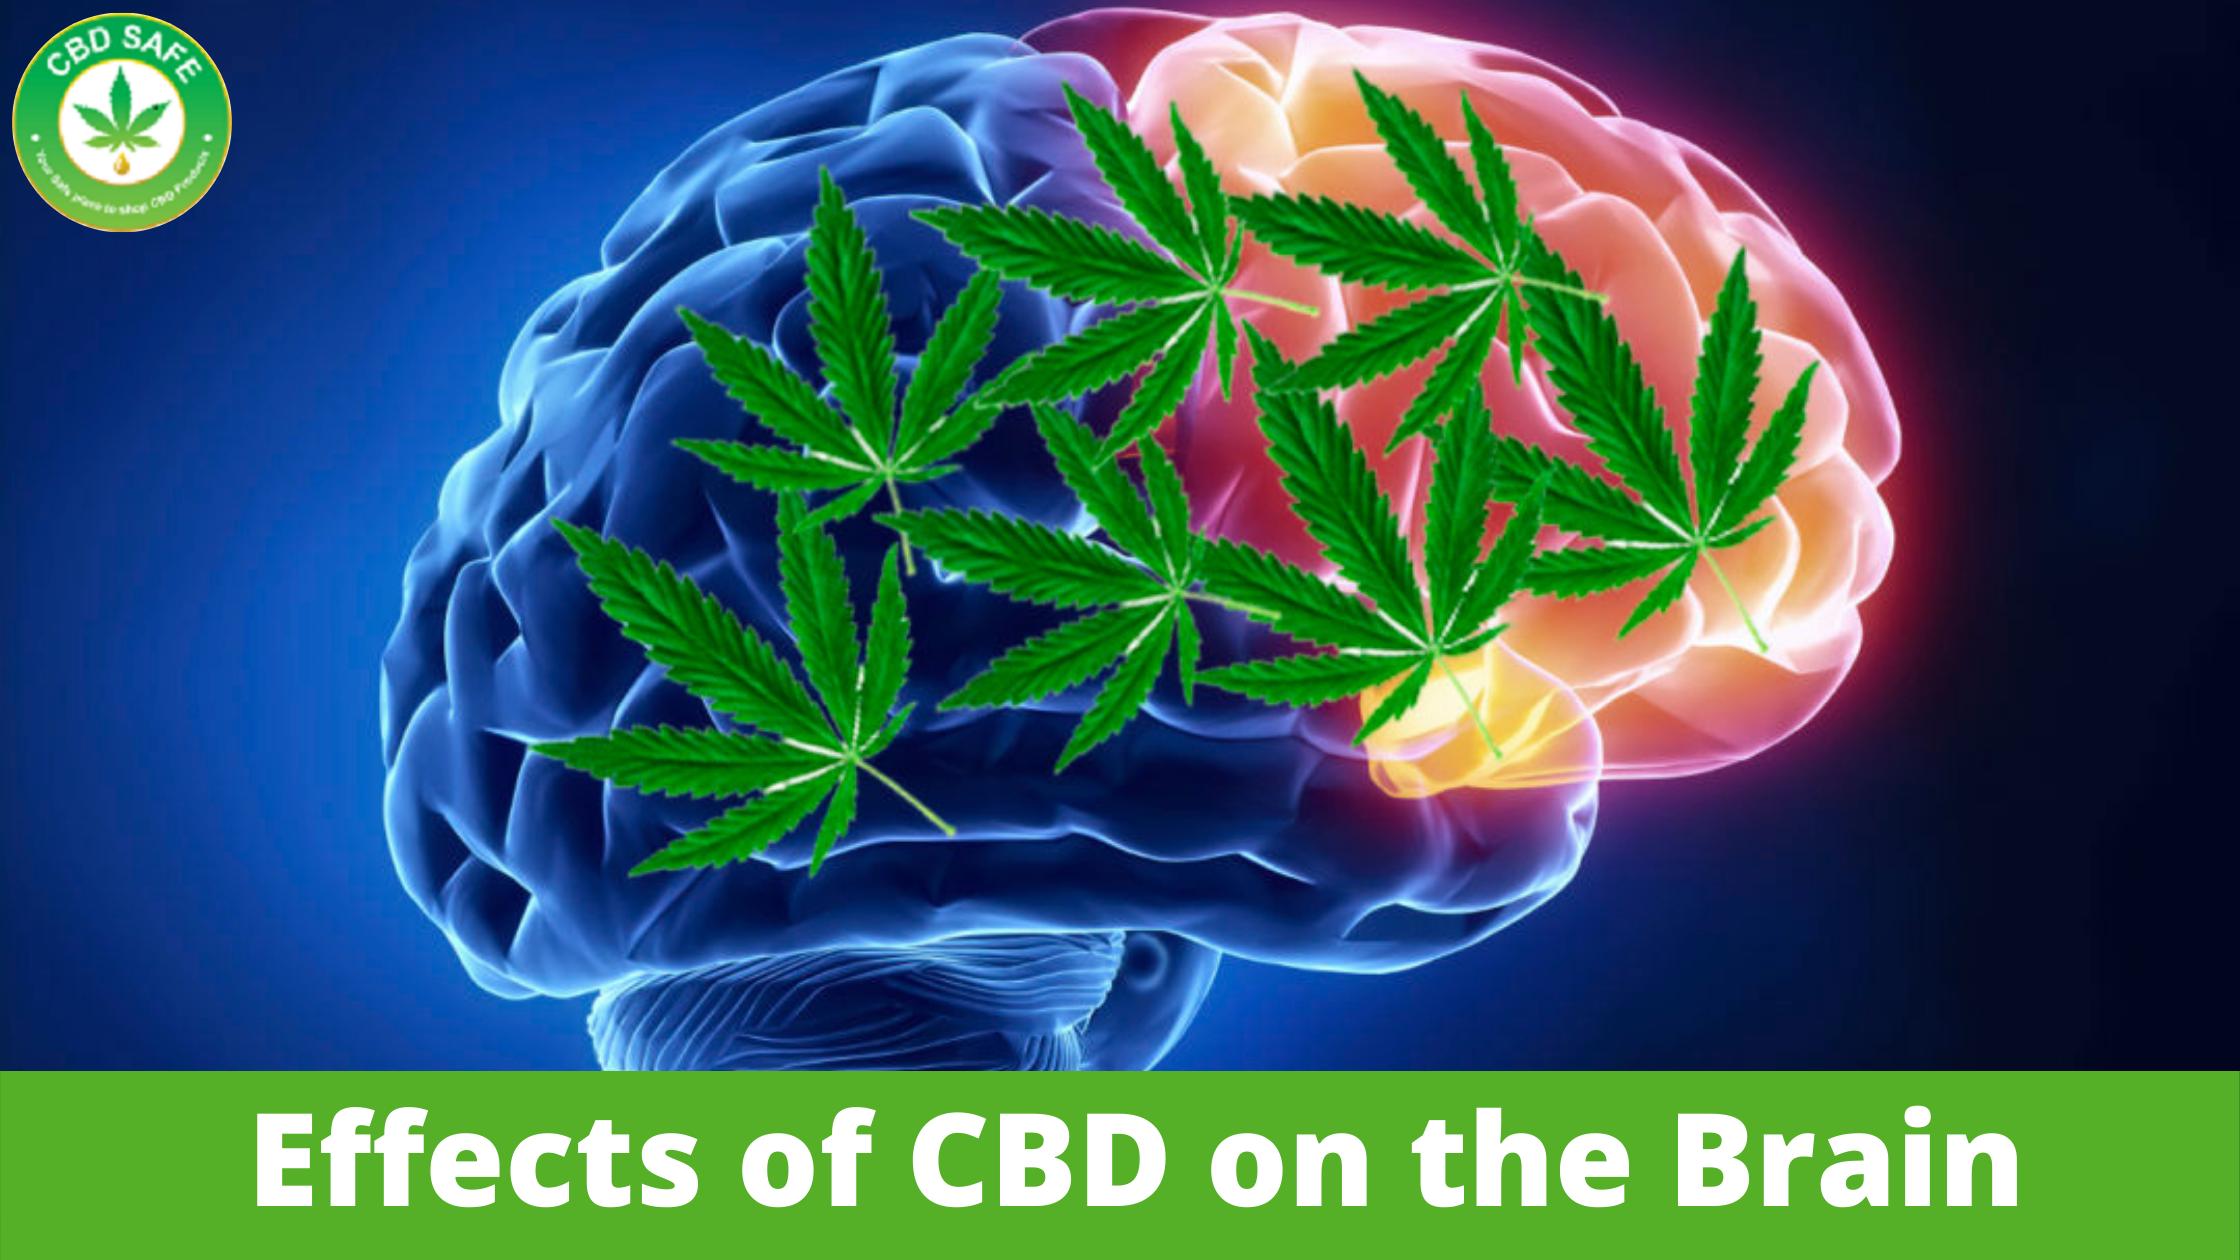 Effects of CBD on the Brain